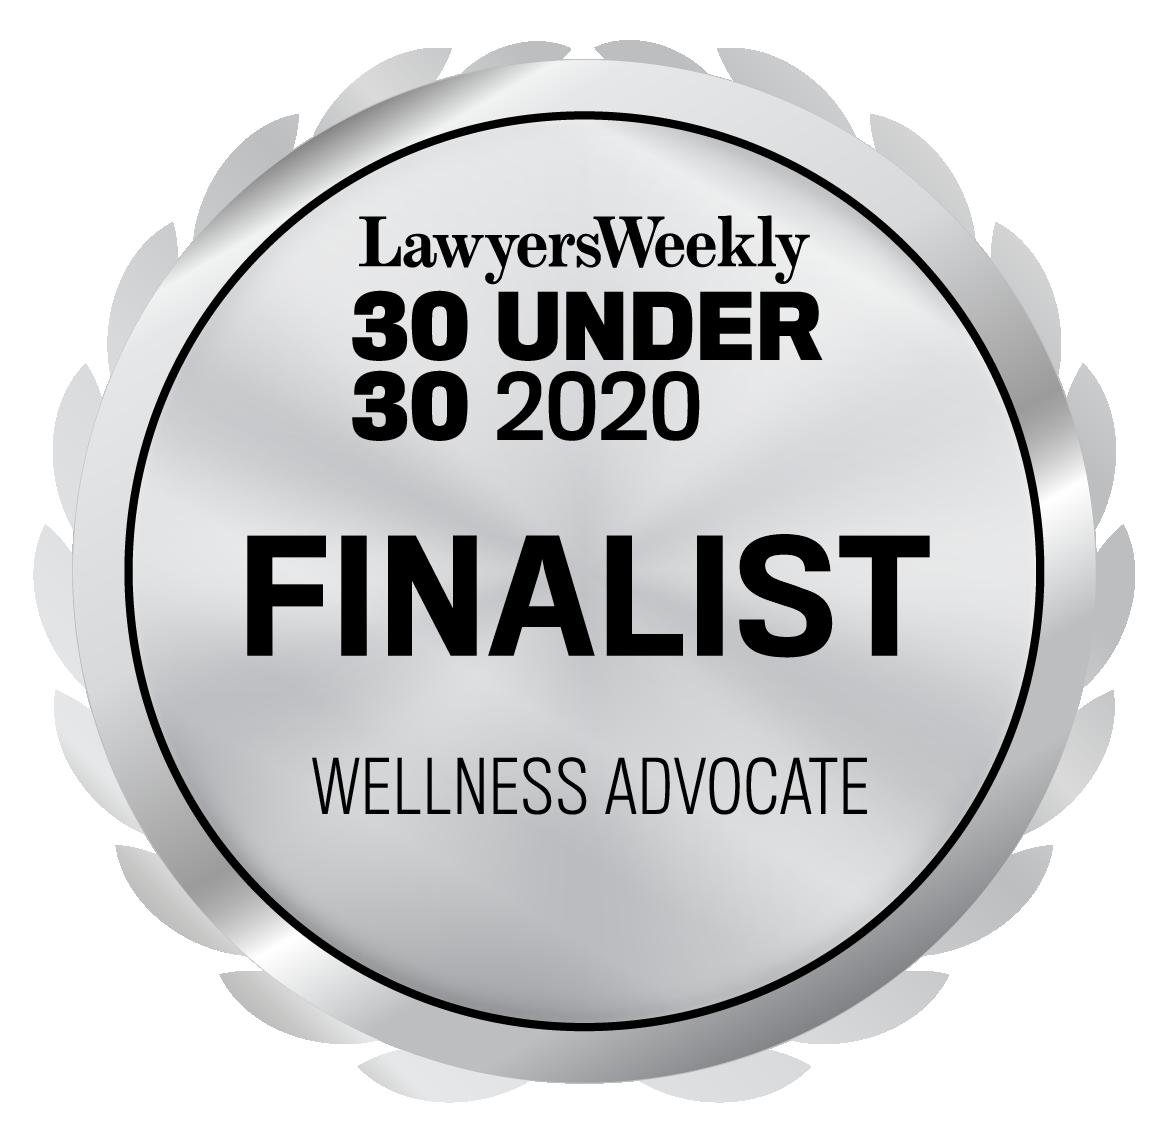 lw finalist wellness